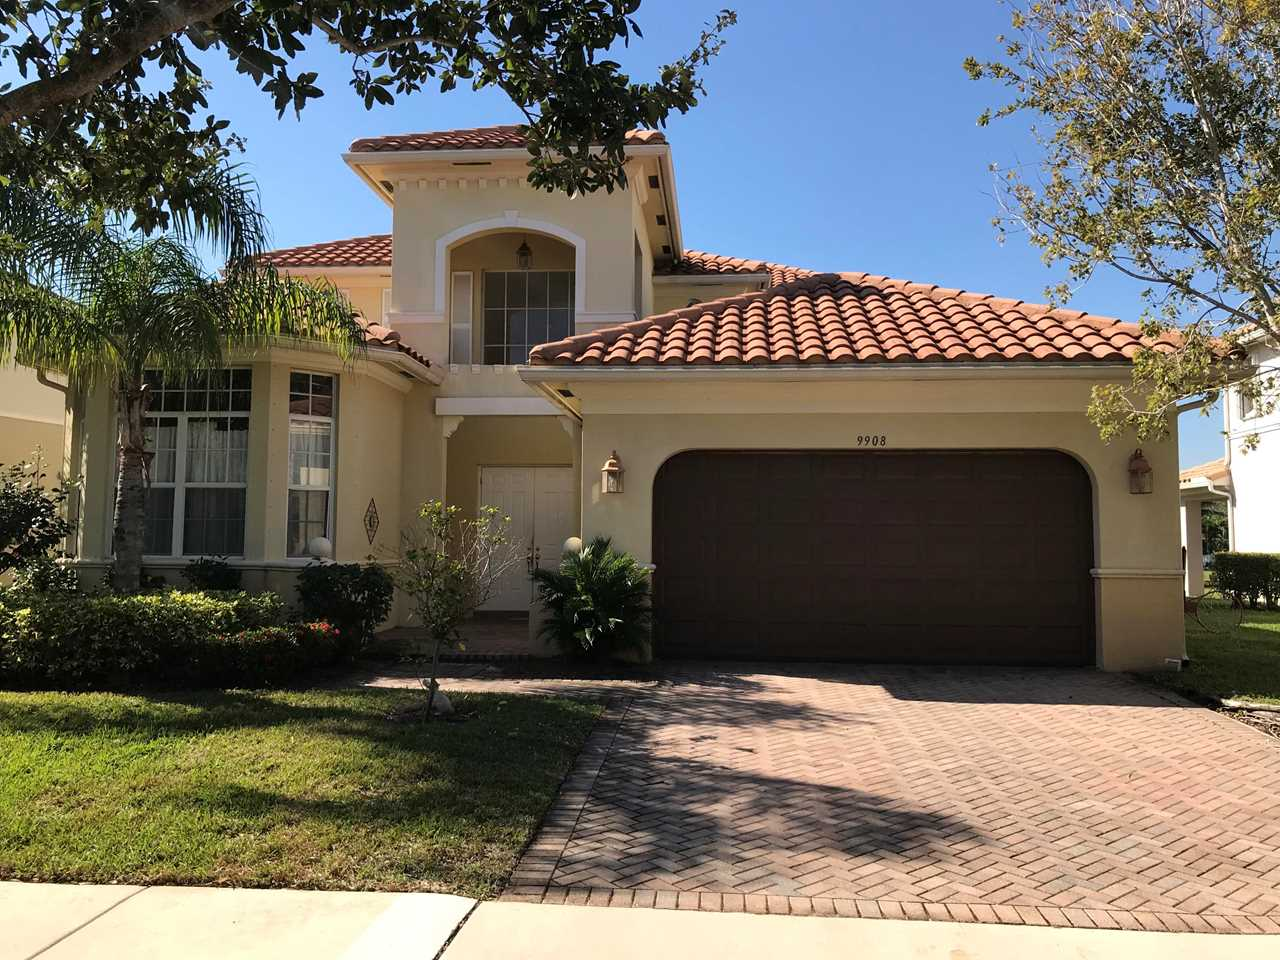 9908 Cobblestone Creek Drive Boynton Beach, FL 33472 - MLS# RX-10493887   BoyntonBeachRealEstate.com Photo 1